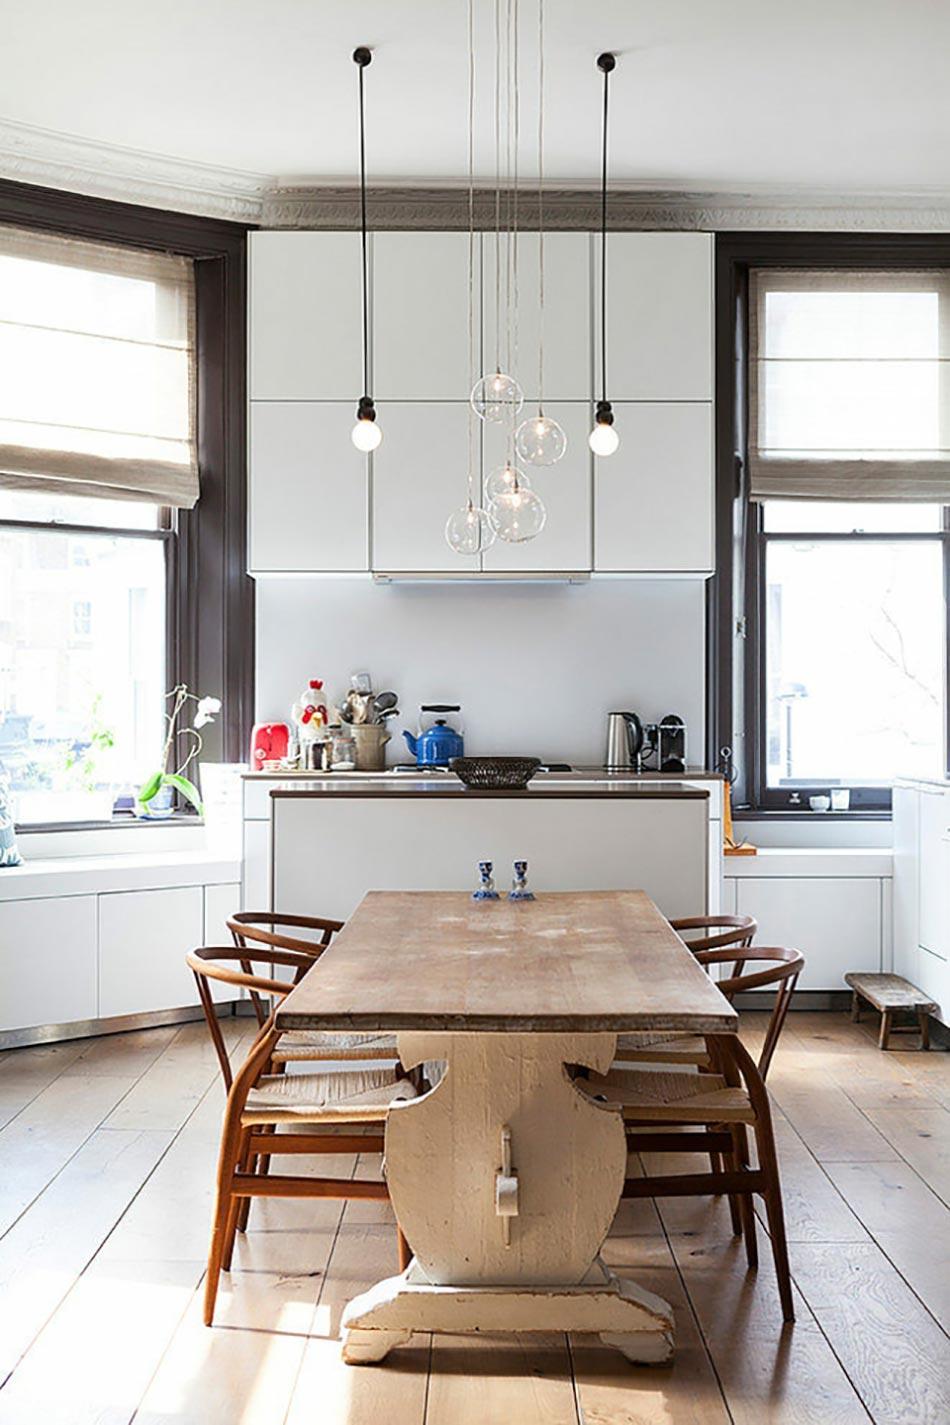 Ikea cuisine luminaire luminaire cuisine moderne for Castorama eclairage cuisine led